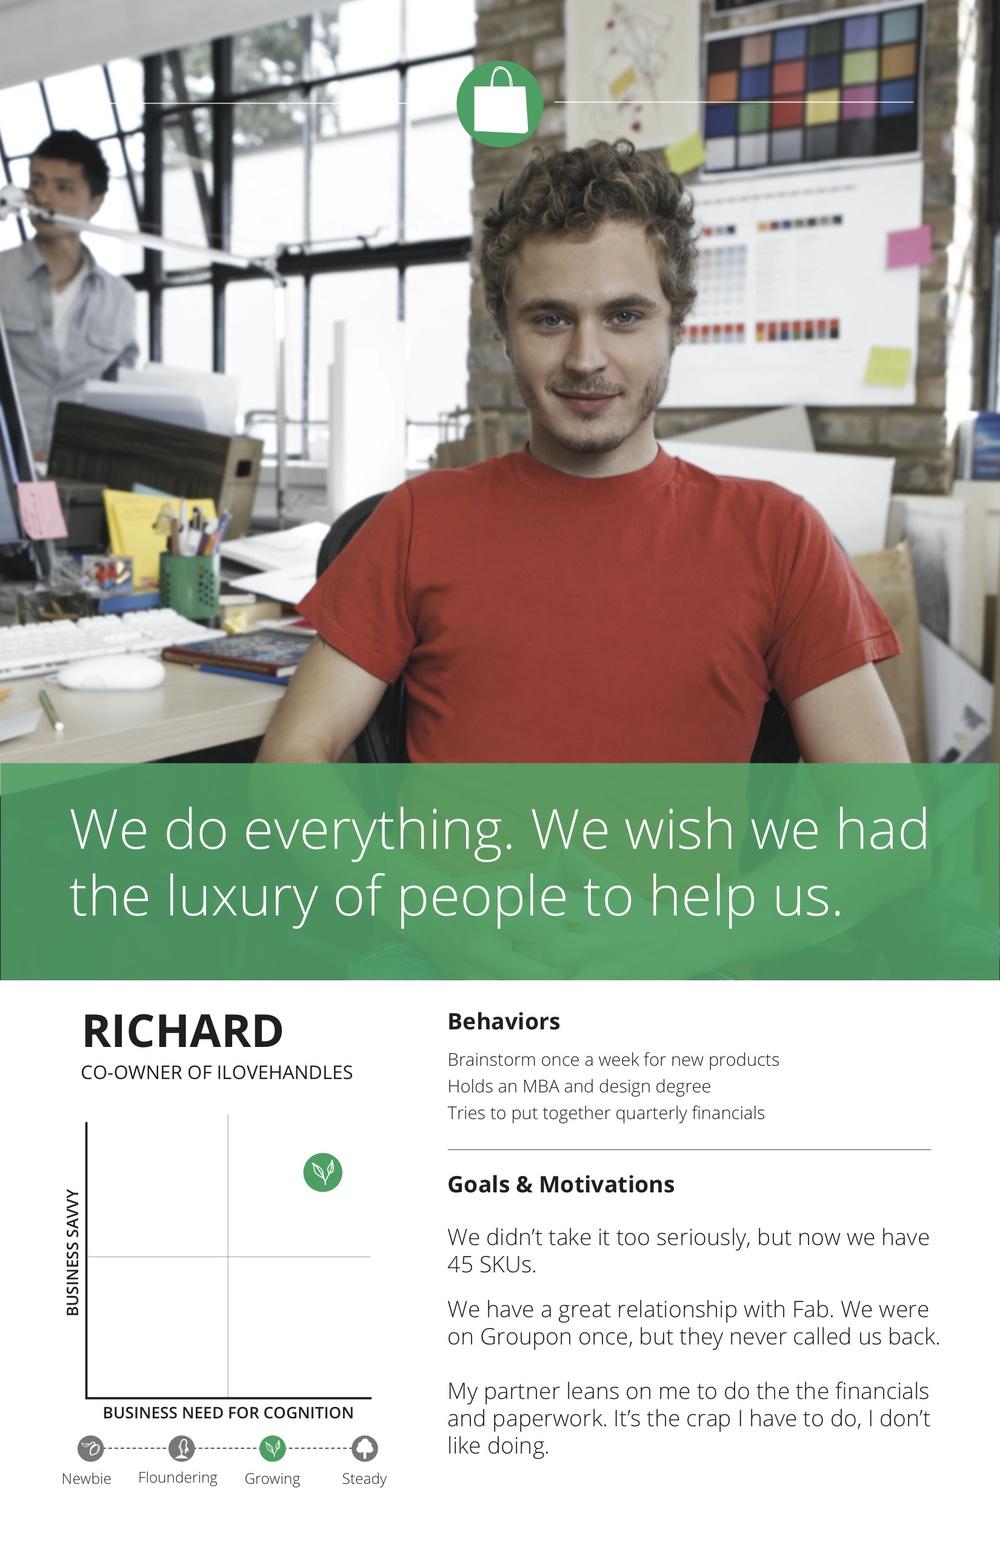 Merchant personas socialilzation poster_Richard.jpg